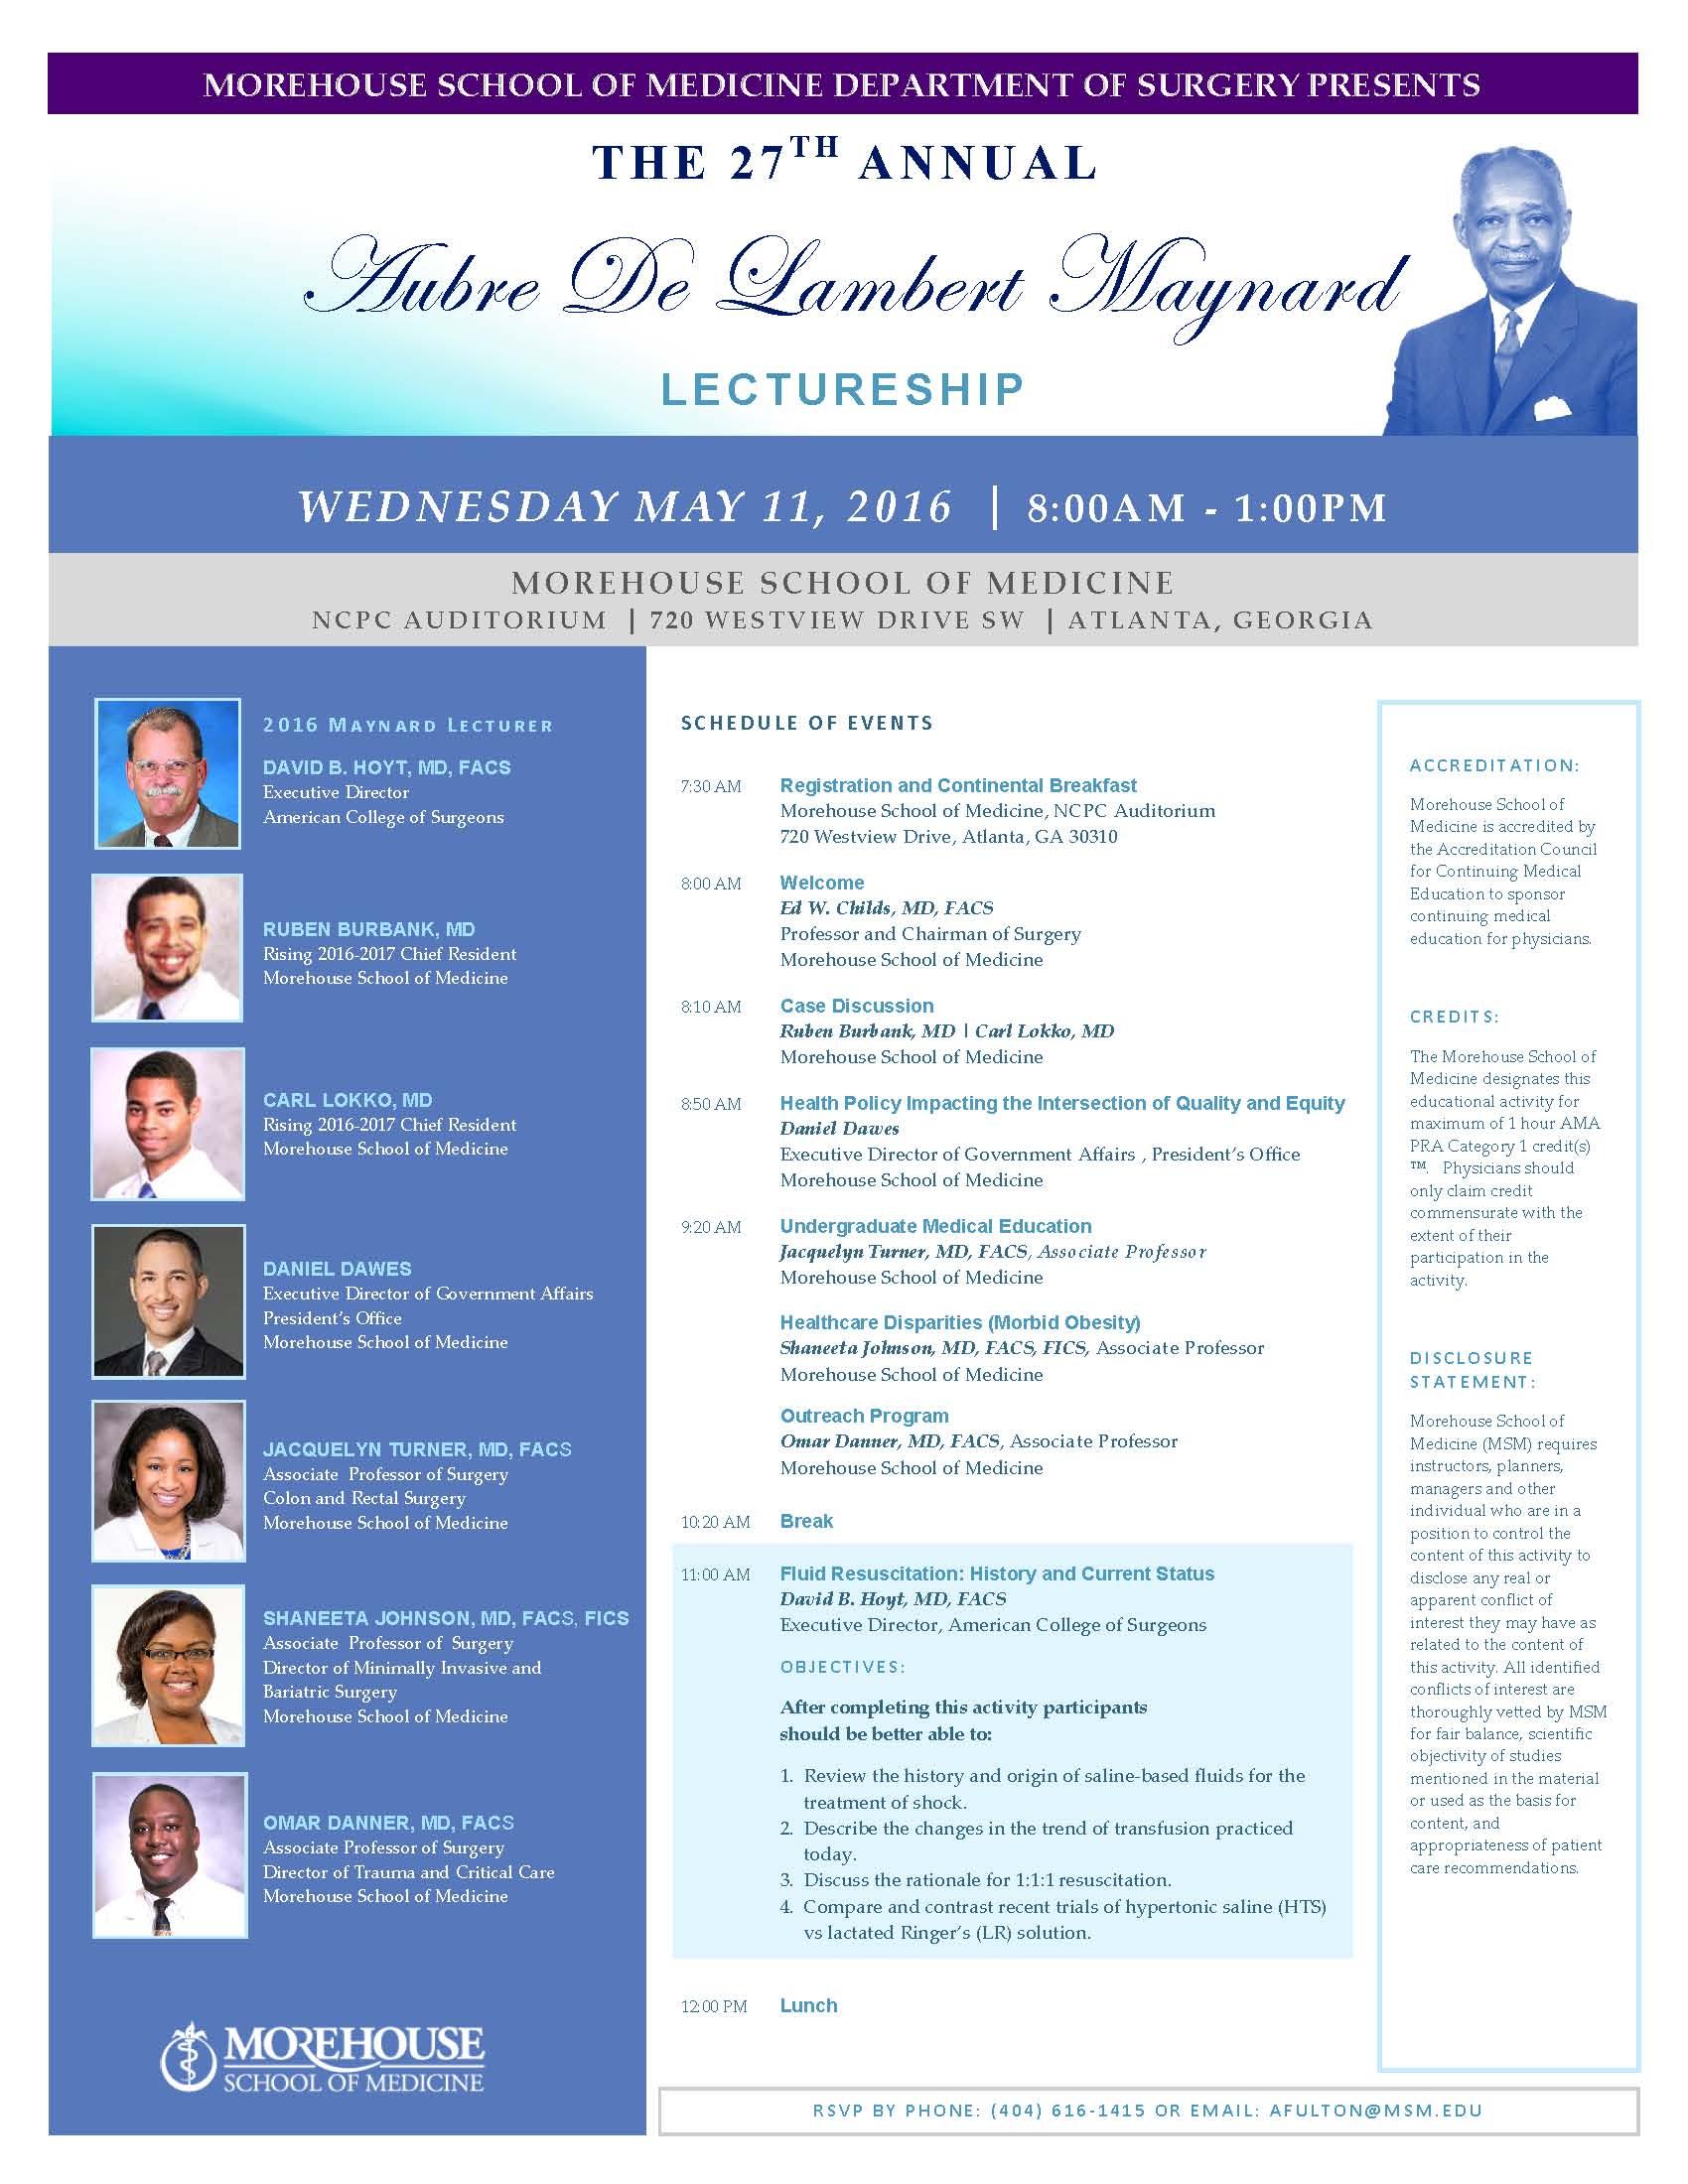 """Fluid Resuscitation"" Topic of 27th Annual Aubre de Lambert Maynard Lectureship"